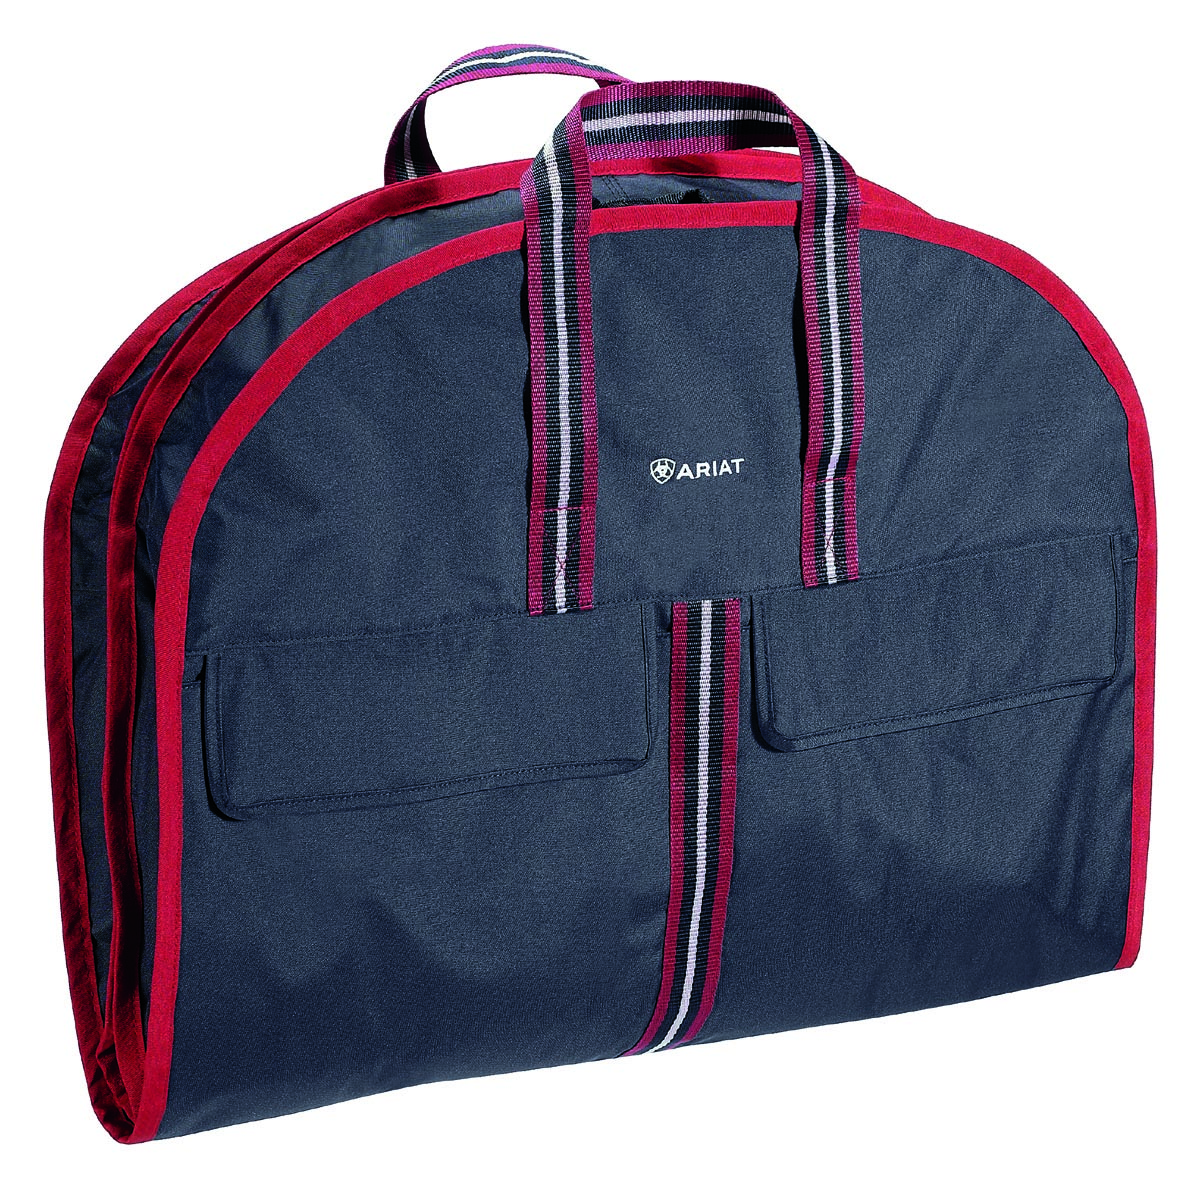 ARIAT ADT Garment Show Bag